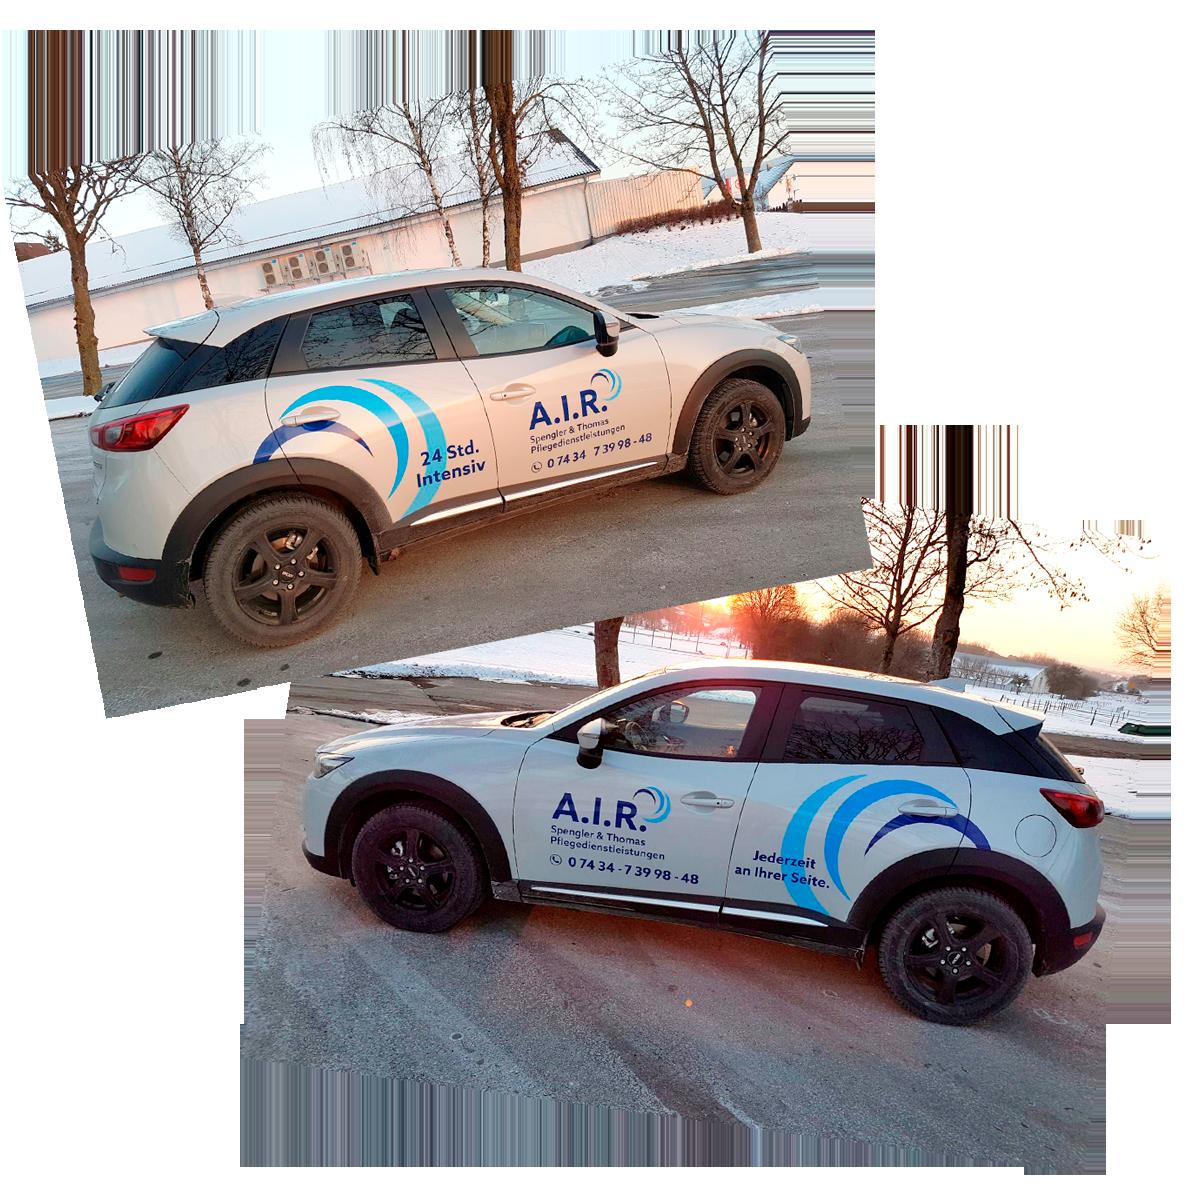 Fahrzeugbeschriftung A.I.R. Spengler & Thomas